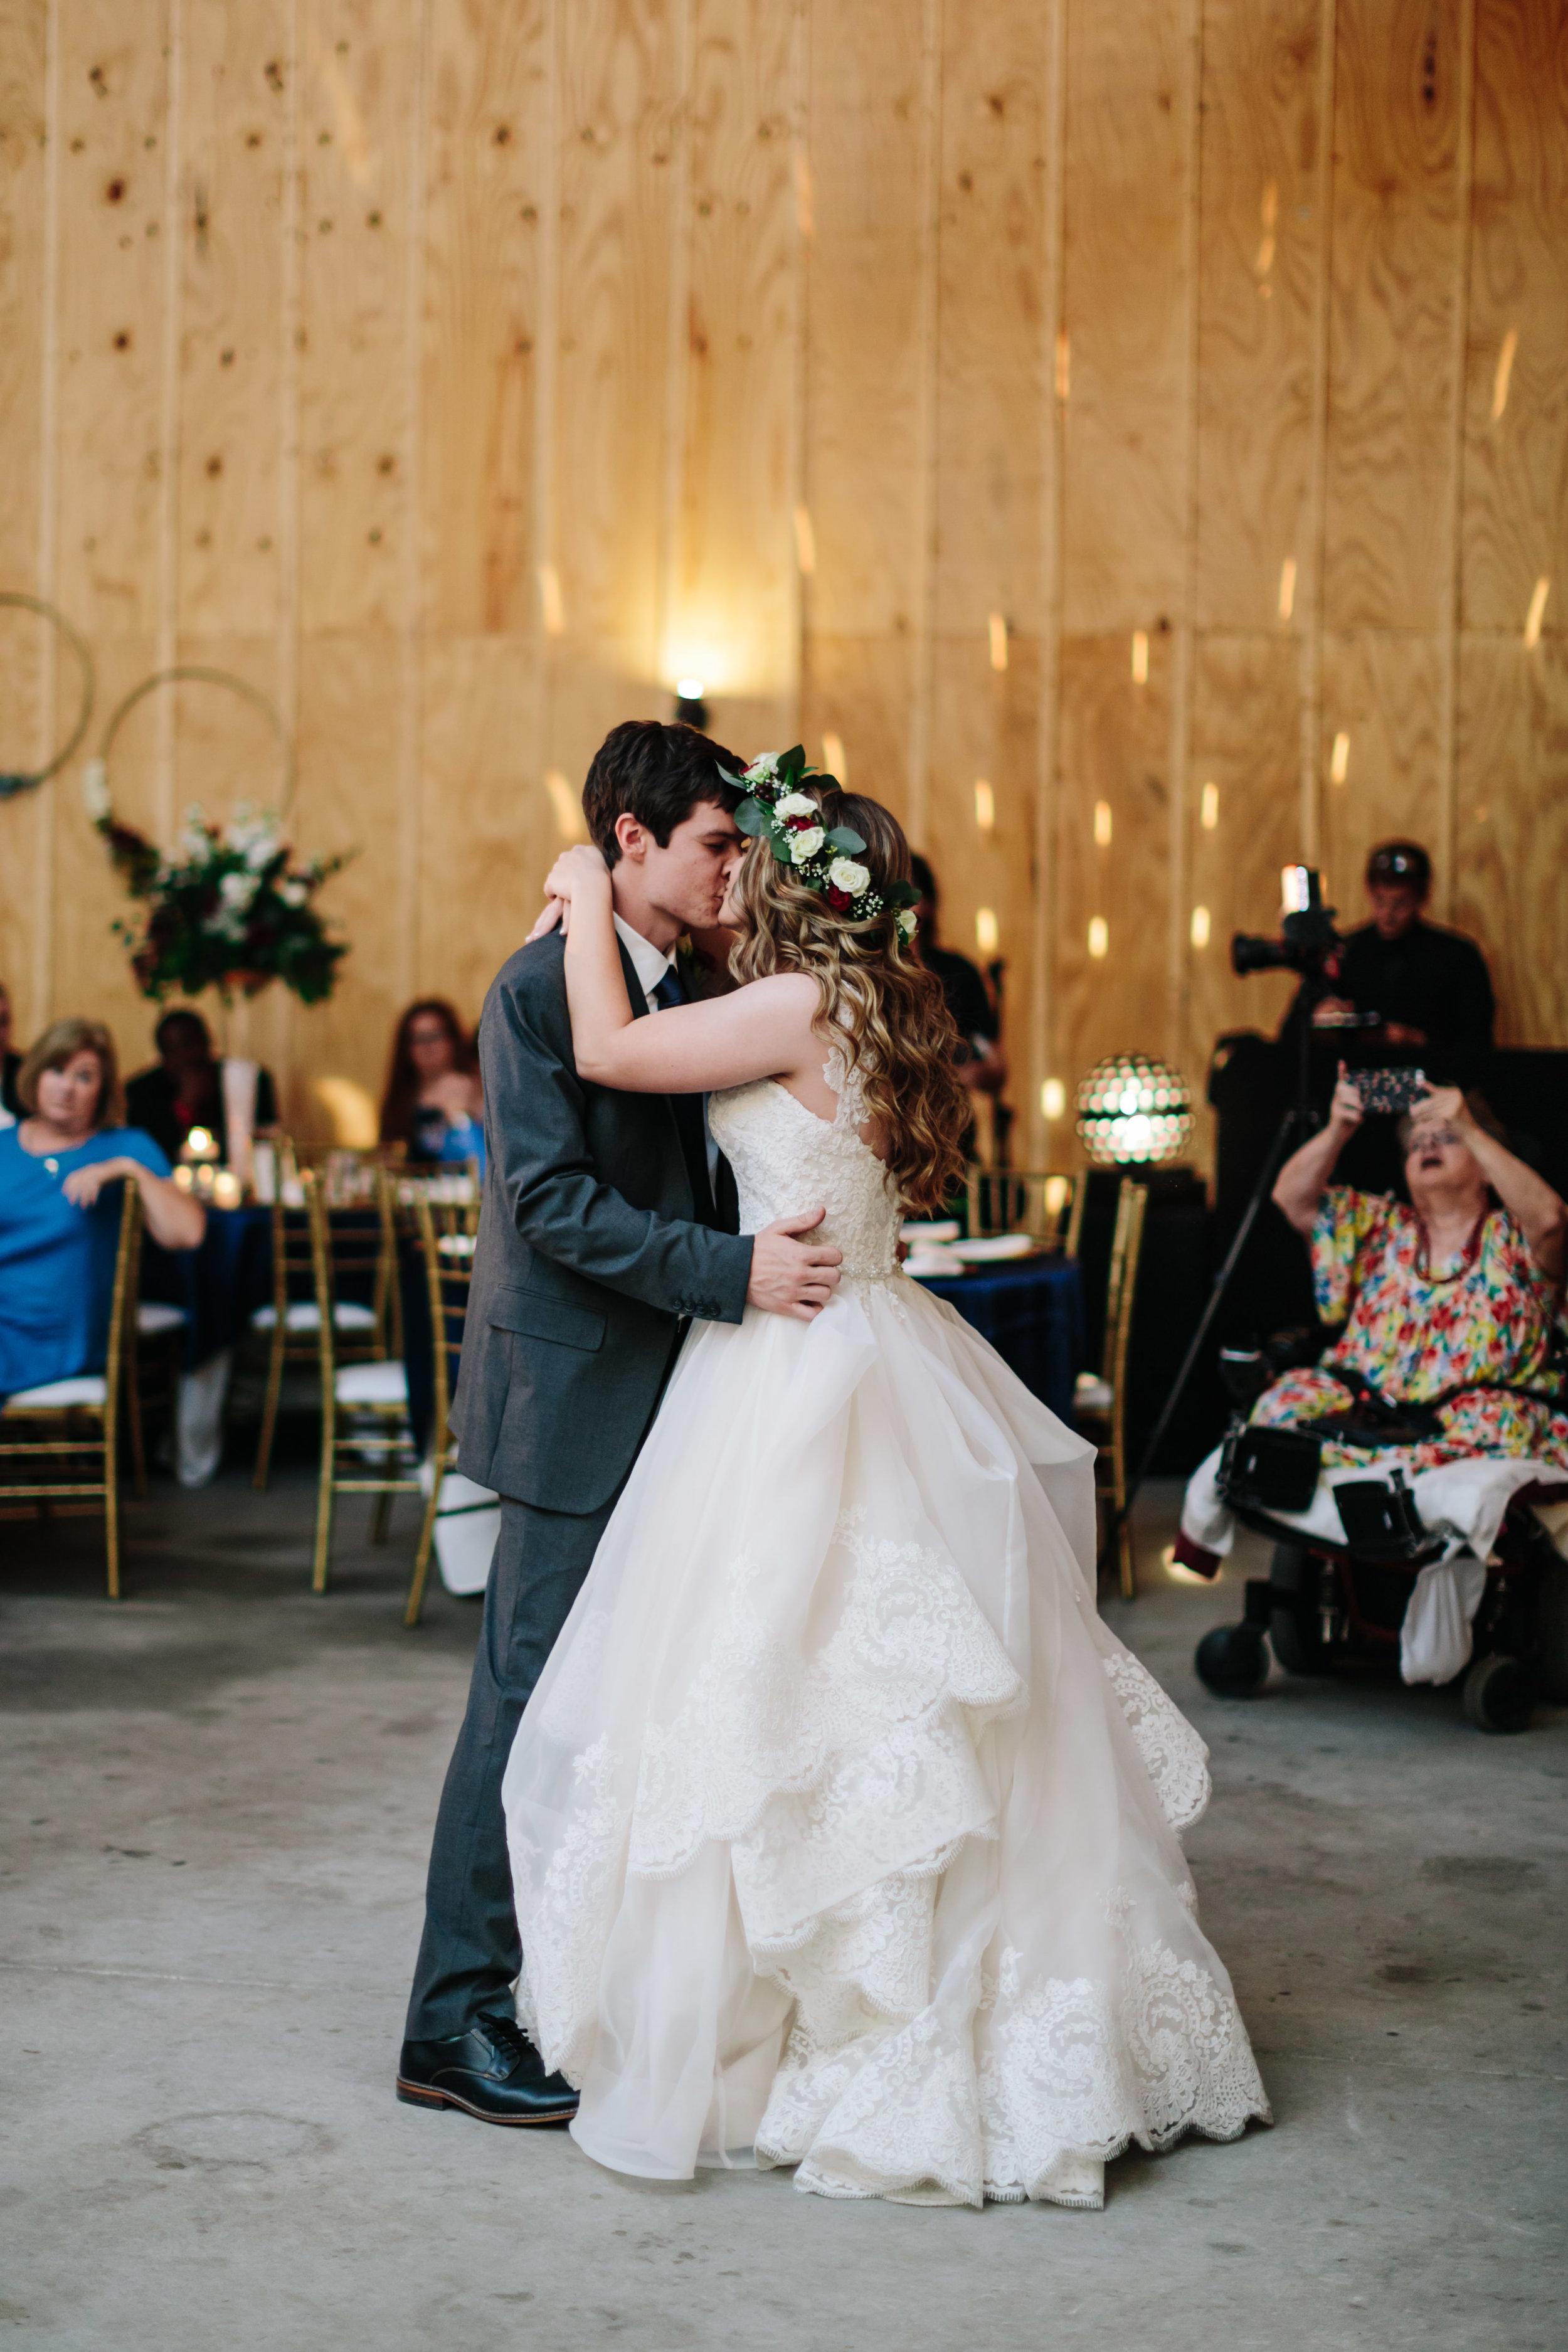 2018.04.14 Zak and Jamisyn Unrue Black Willow Barn Wedding Finals-629.jpg